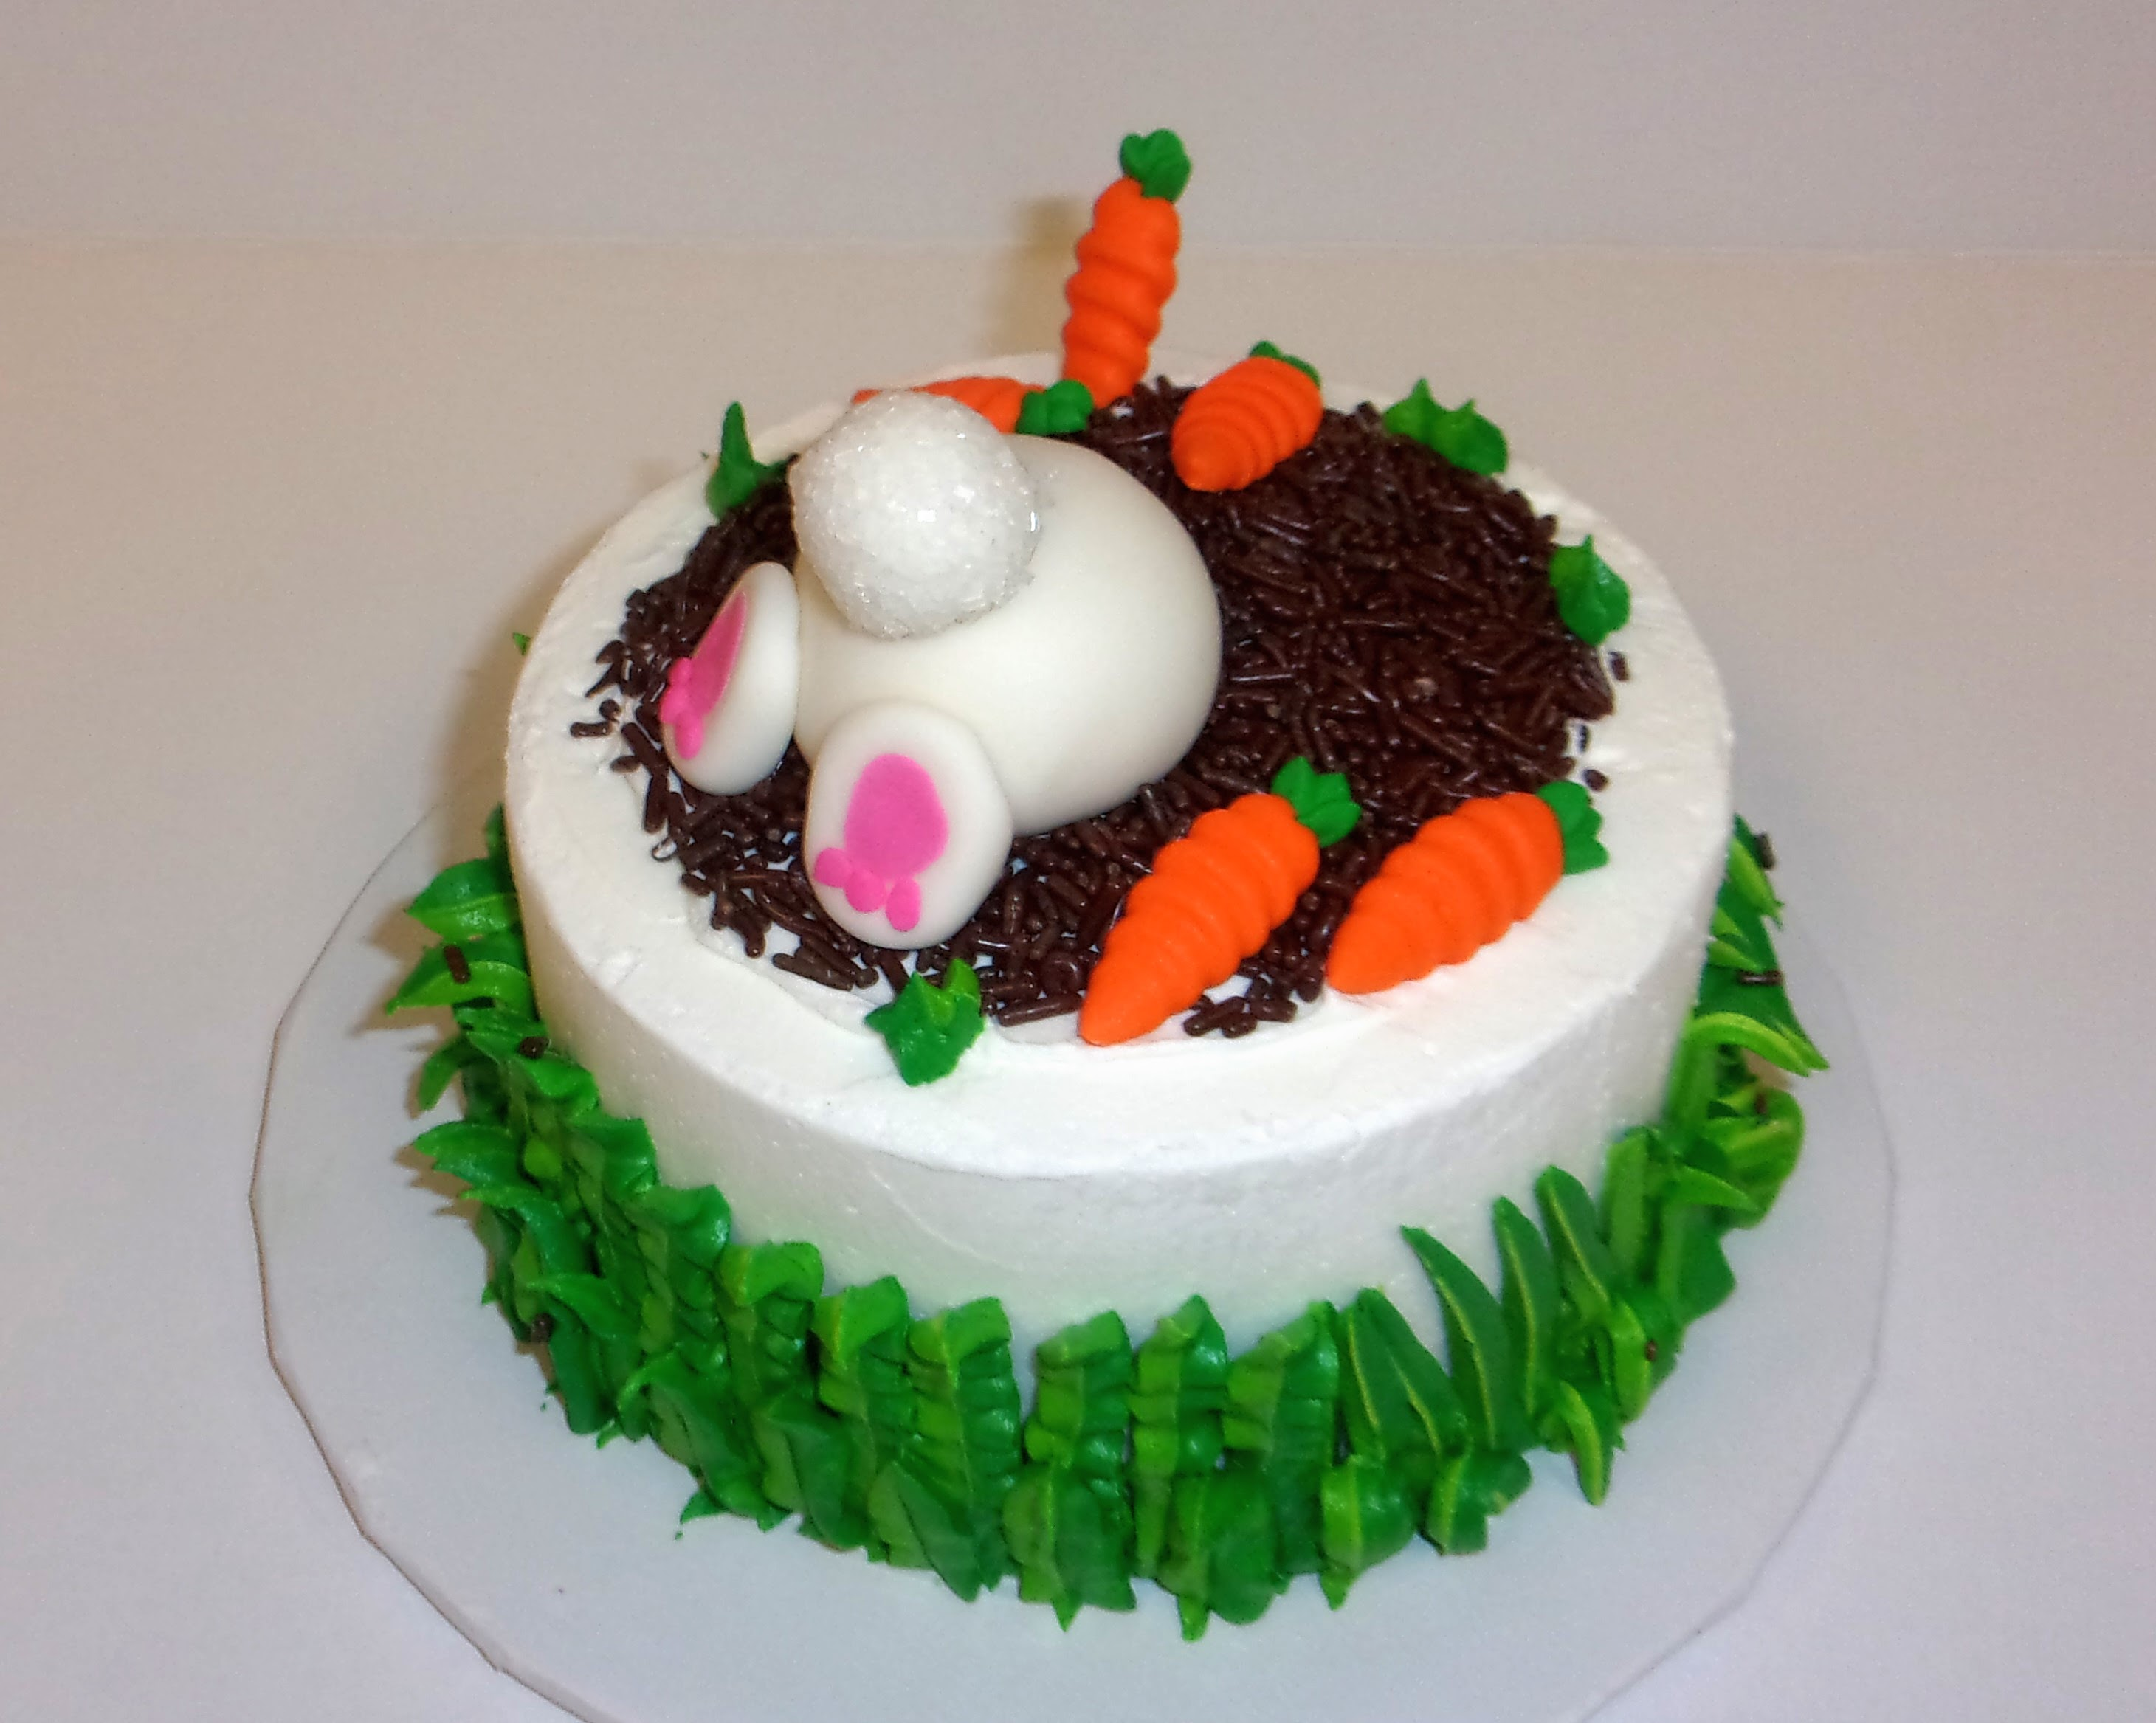 Cake Decorating Classes In Texas